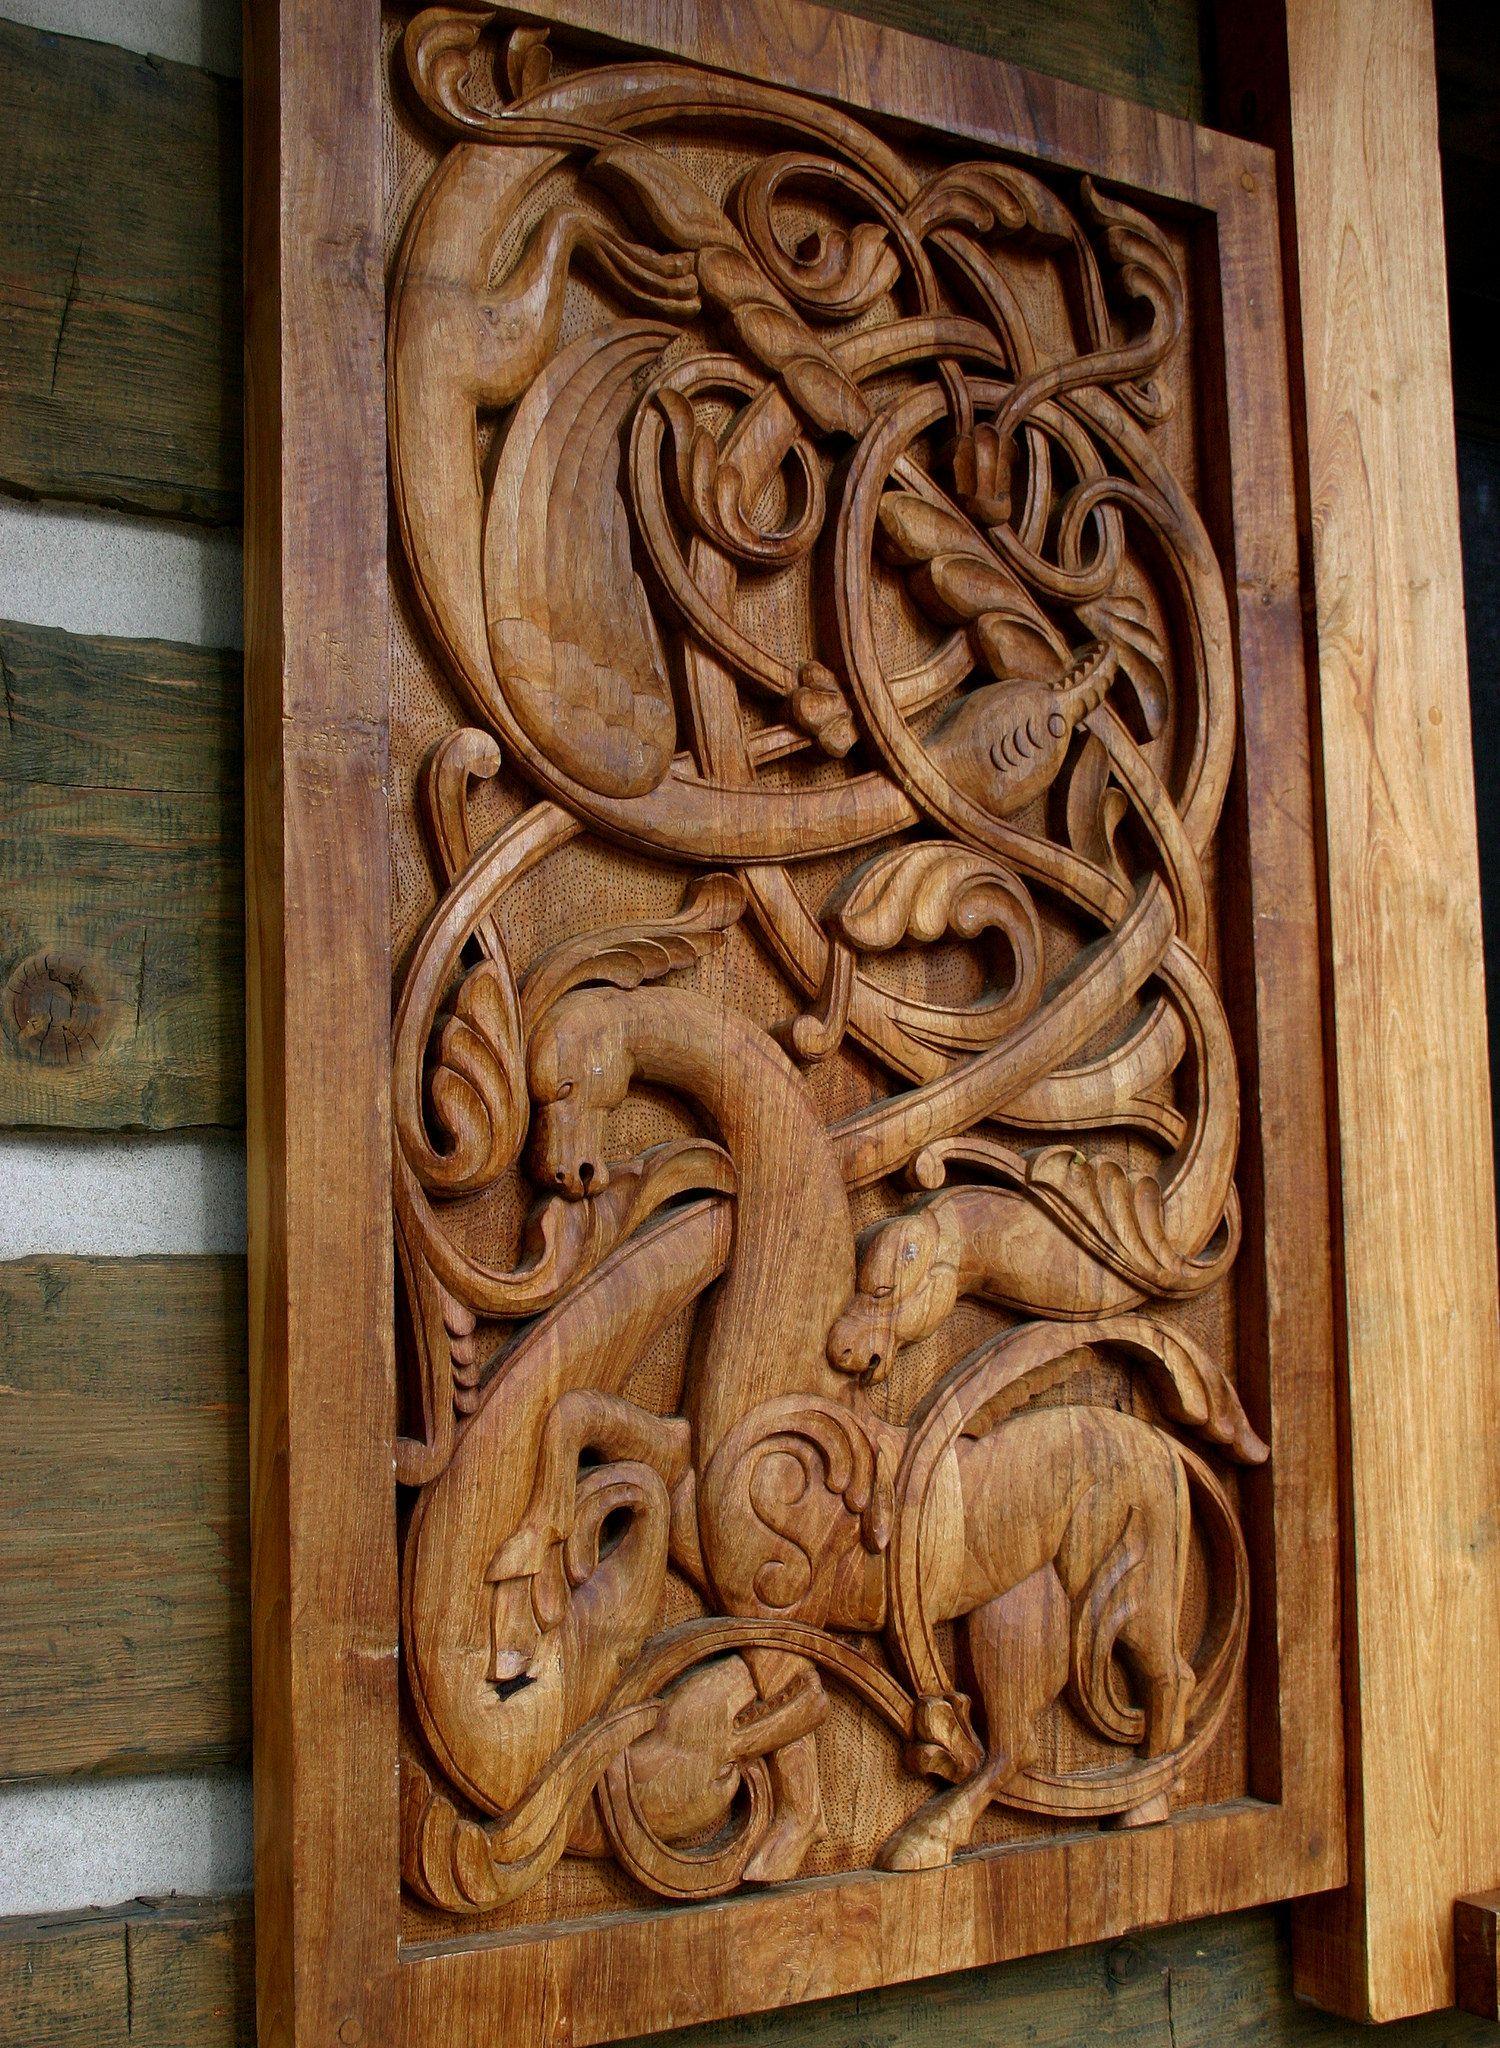 Viking dragon carving in scandihoovia